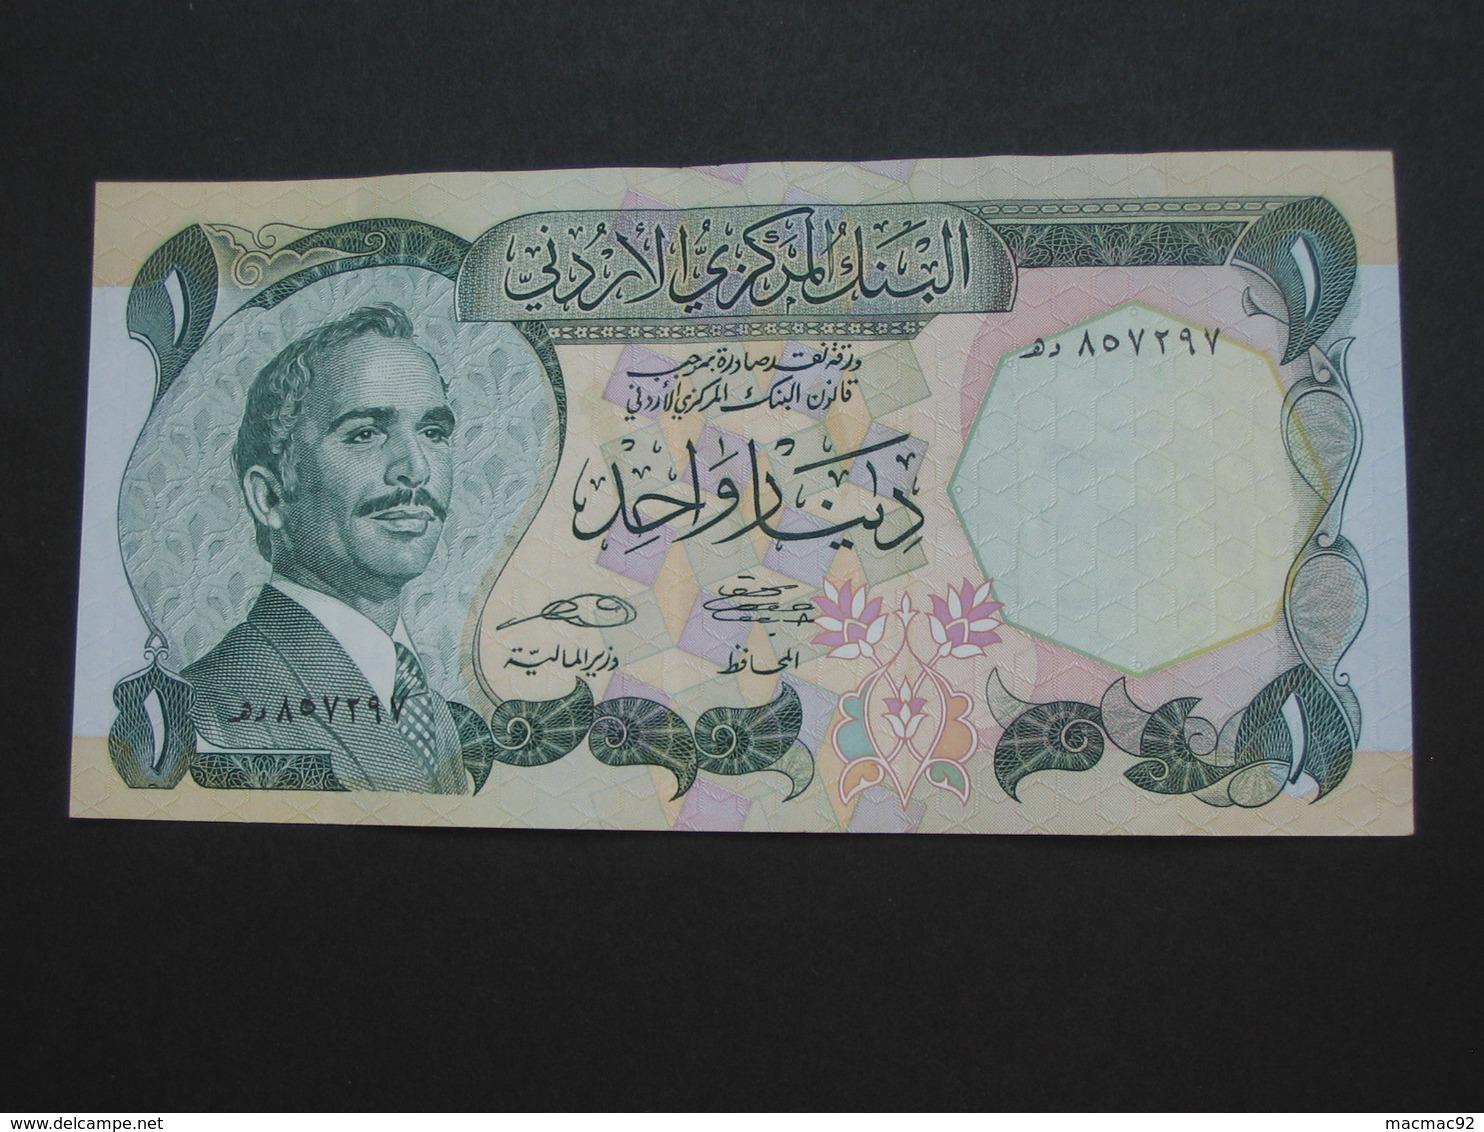 1 One Dinar - JORDANIE - Central Bank Of Jordan **** EN ACHAT IMMEDIAT **** - Jordanie